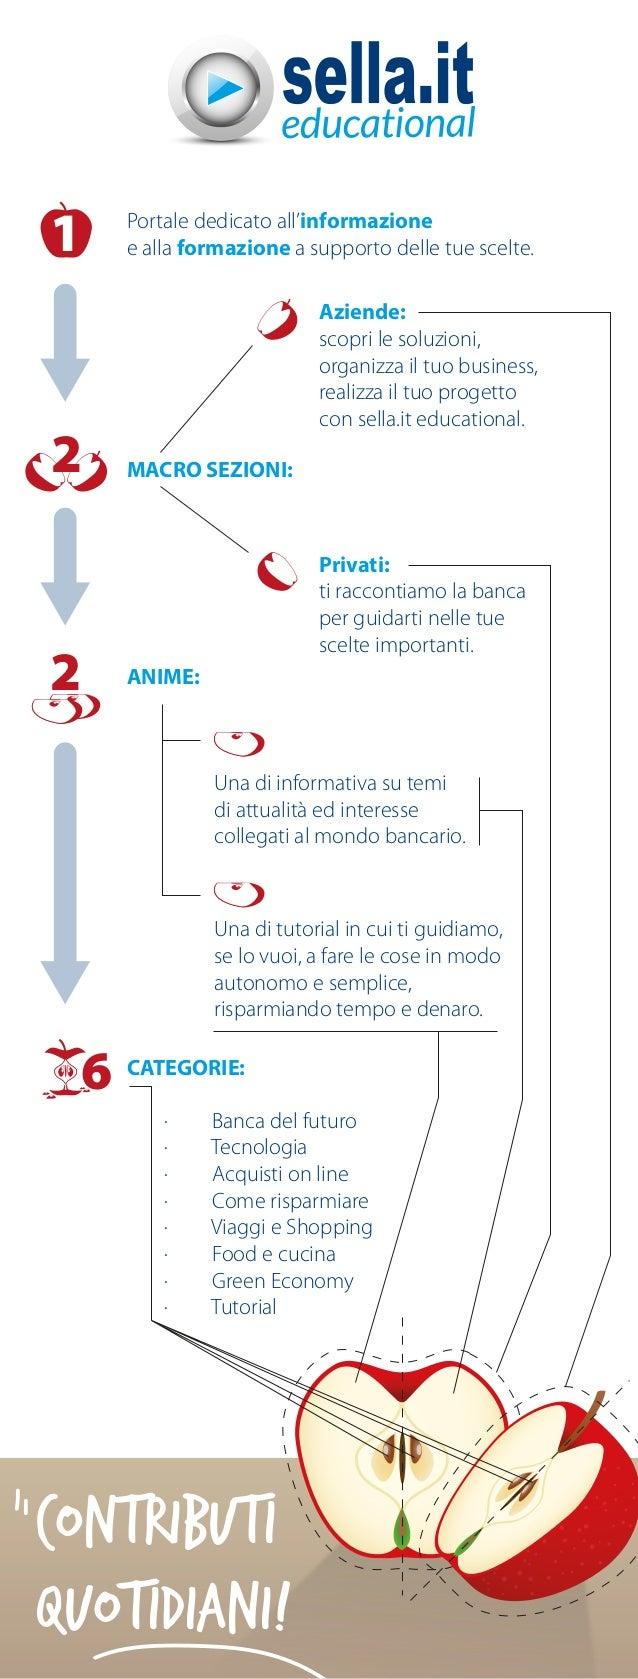 Infografica - Sella.it Educational